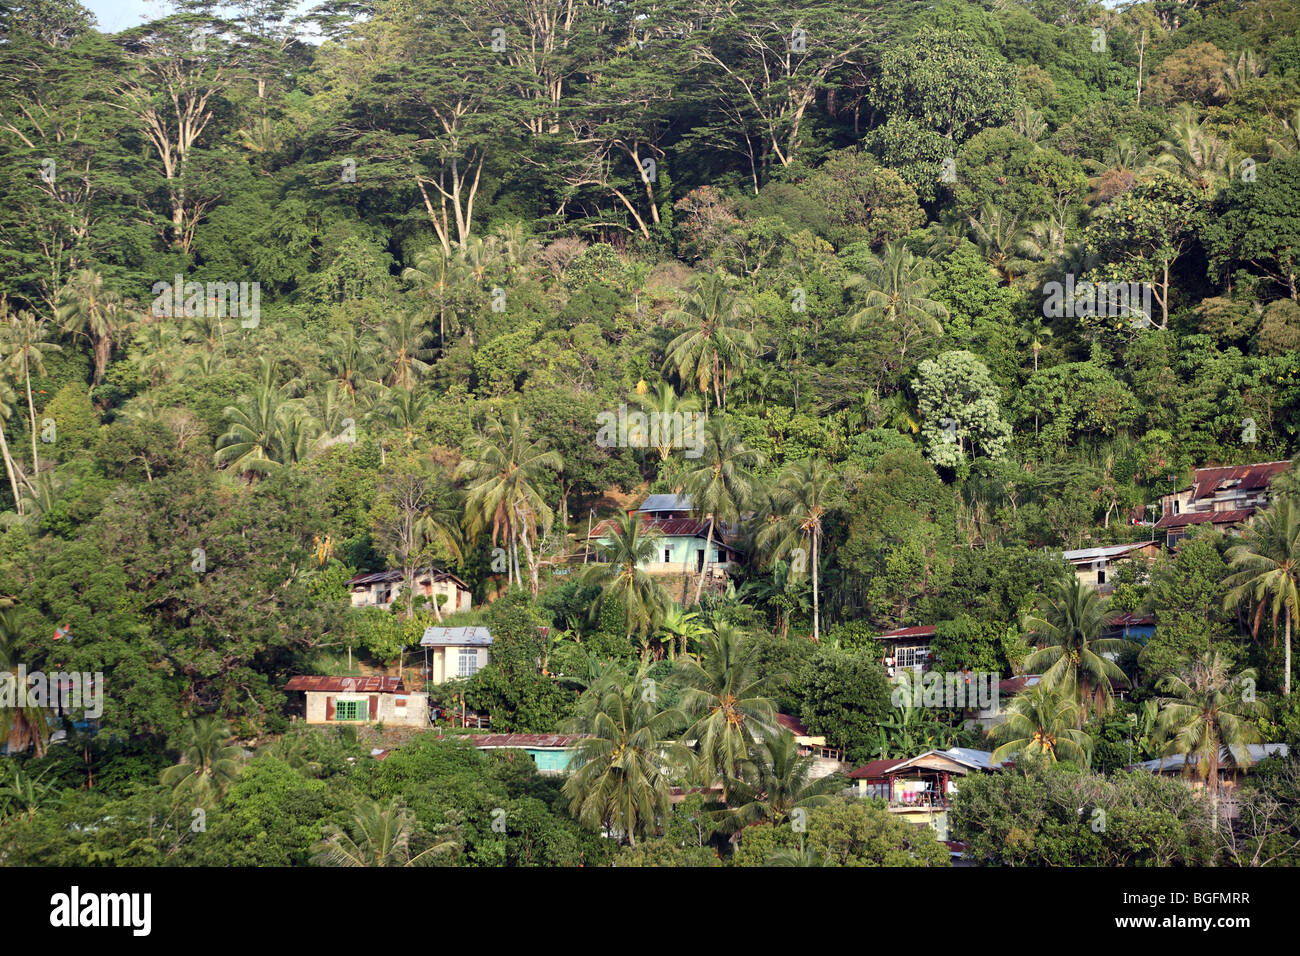 Hillside houses next to the Batang Arau River in Padang - Stock Image